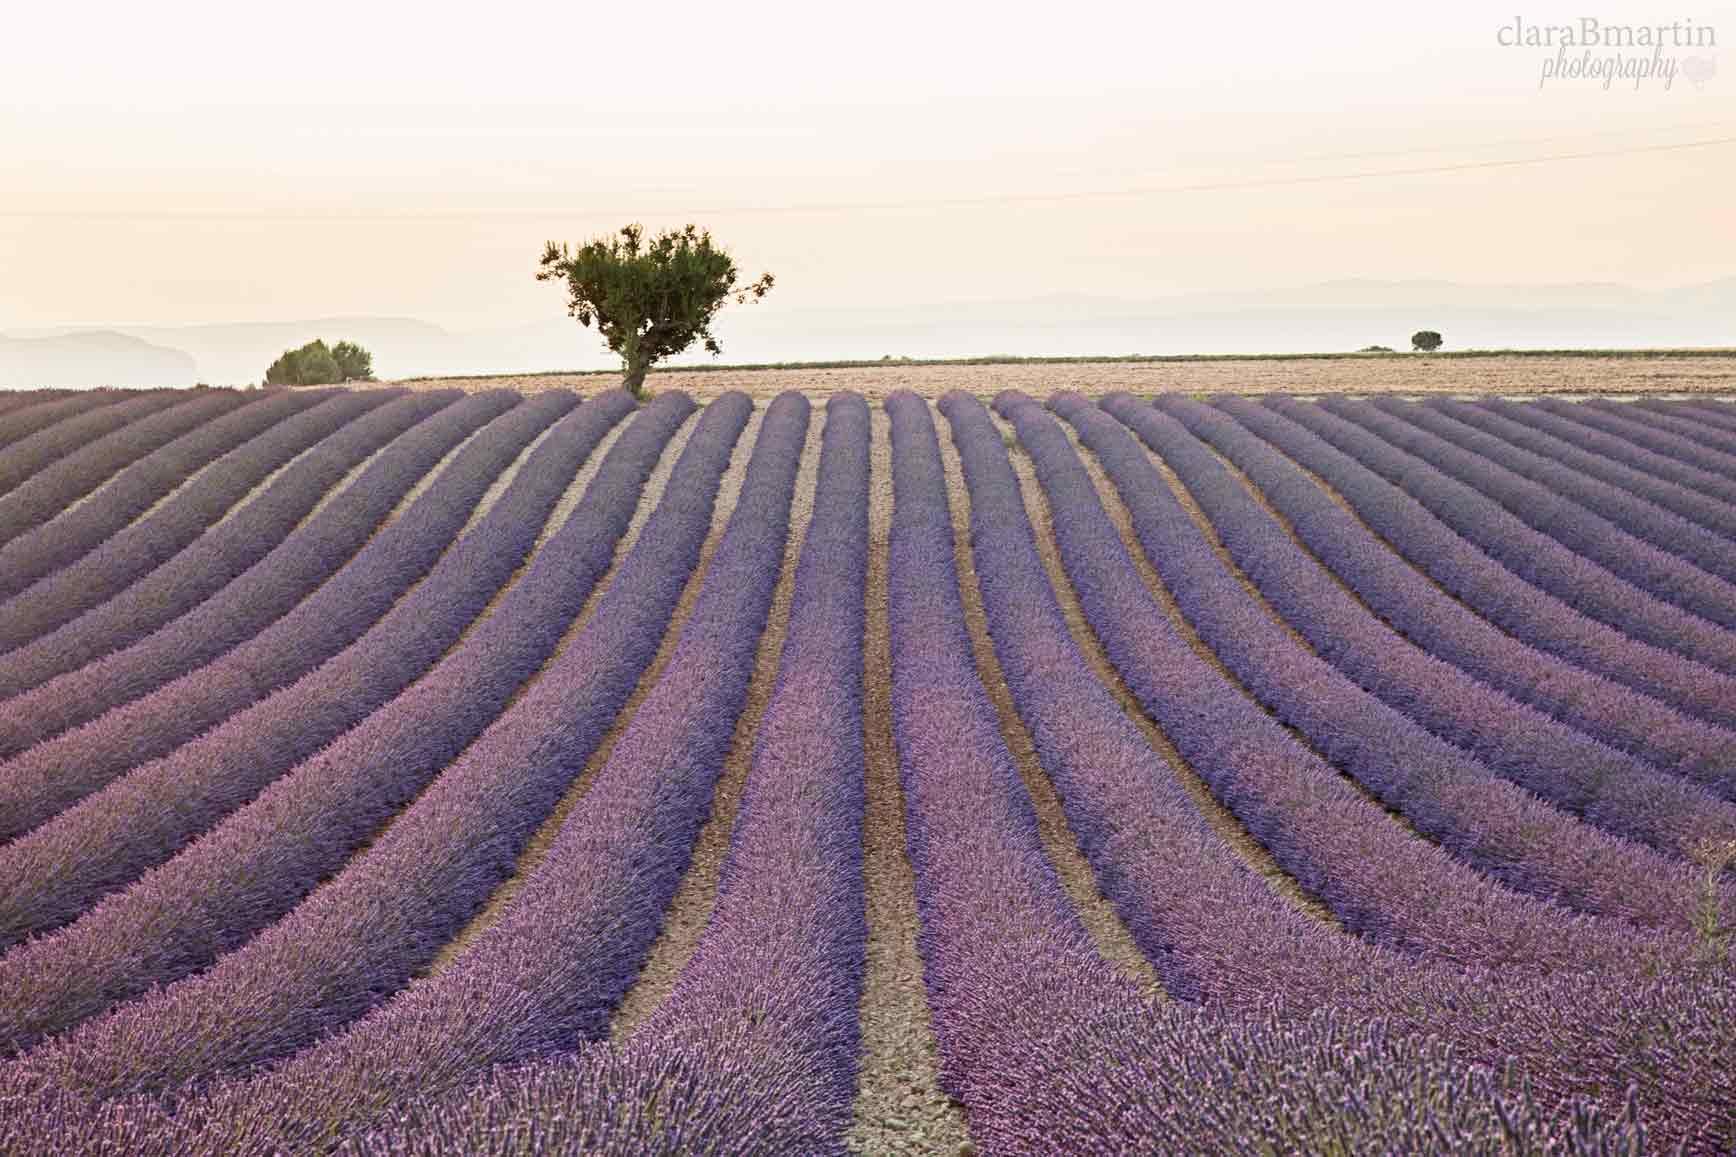 Lavender-fields-Provence-claraBmartin14